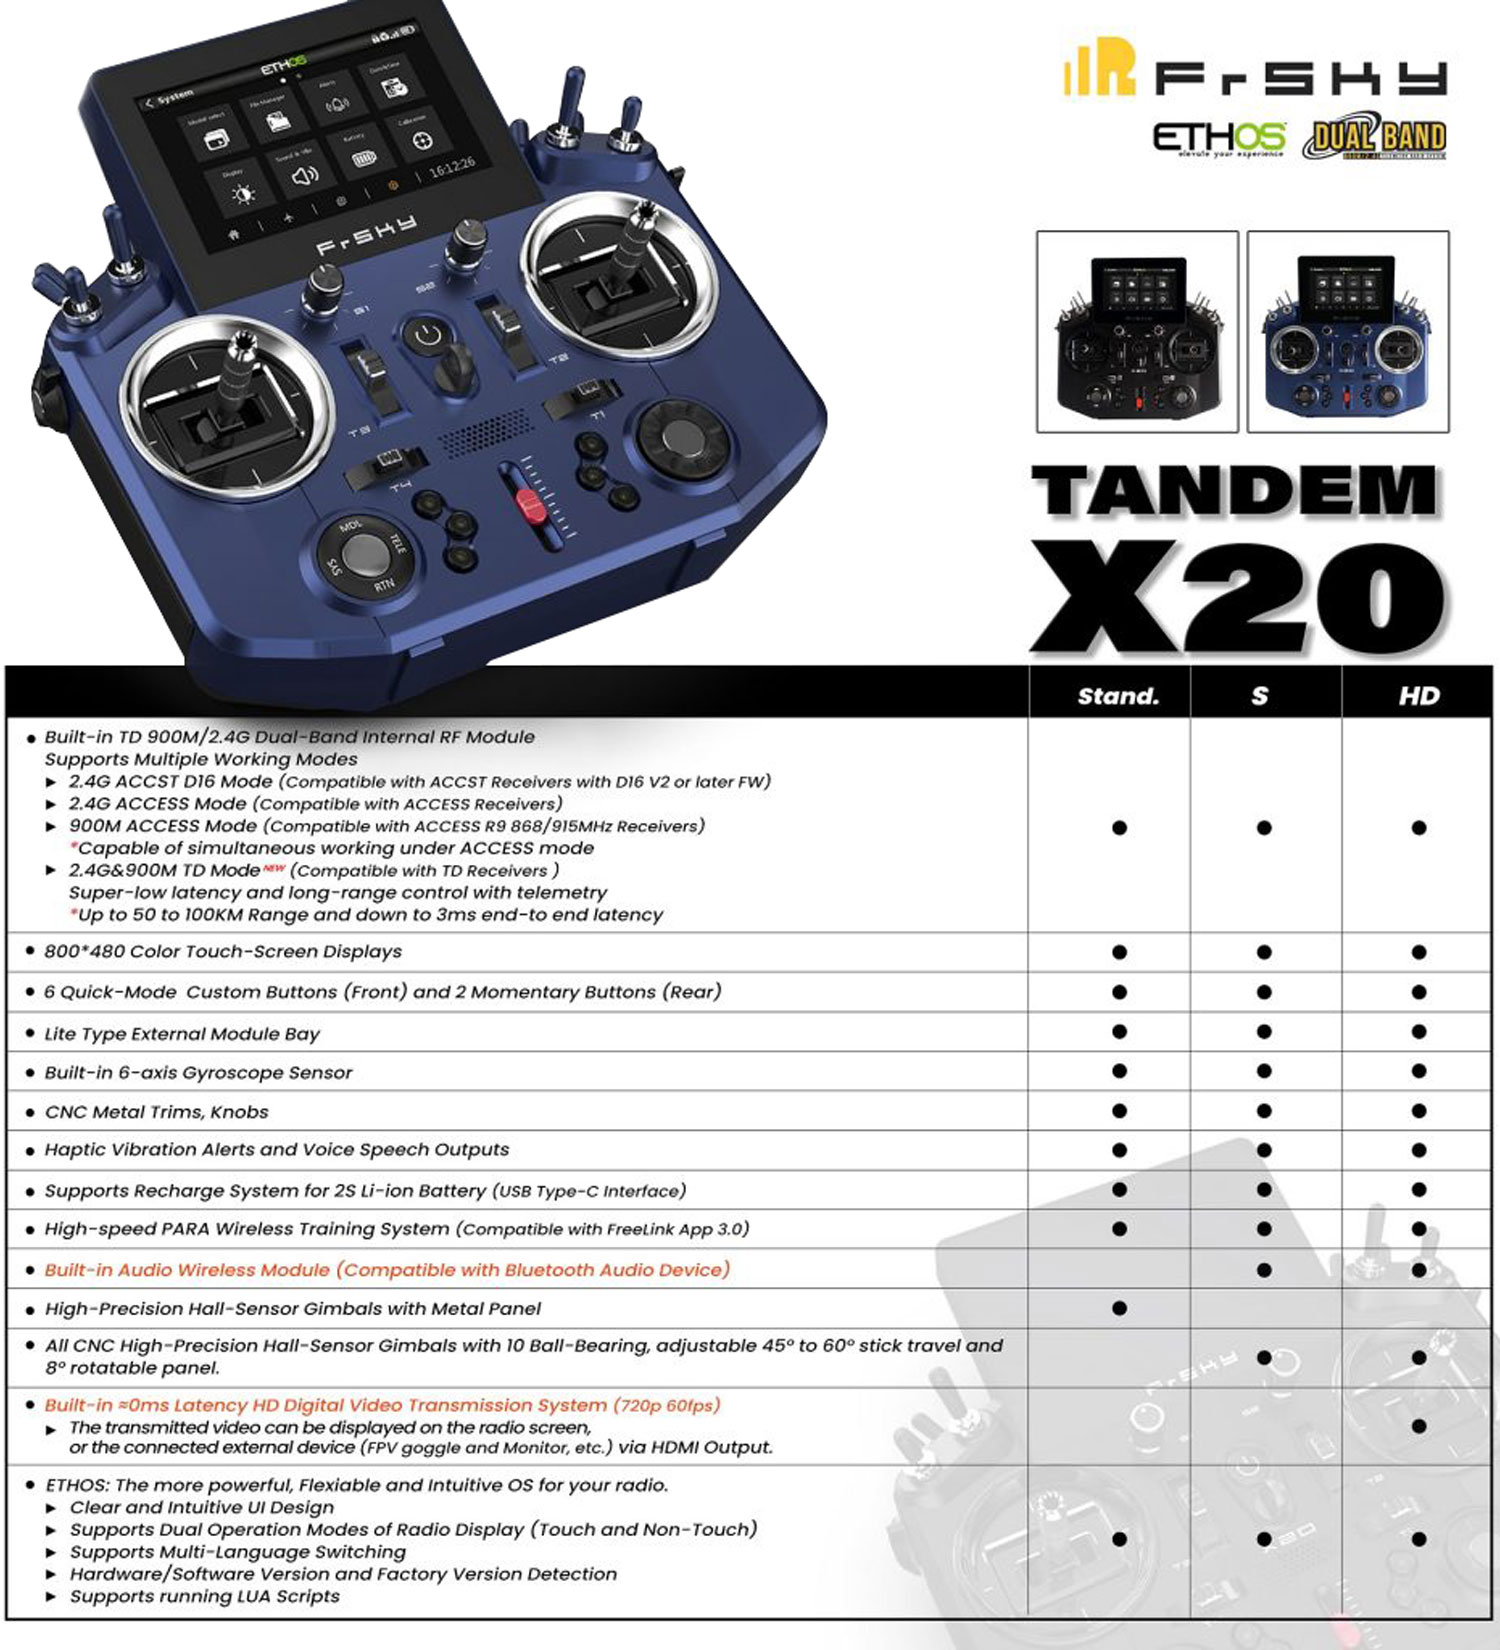 frsky-tandem-20-ethos-radio-systems_6a.jpg